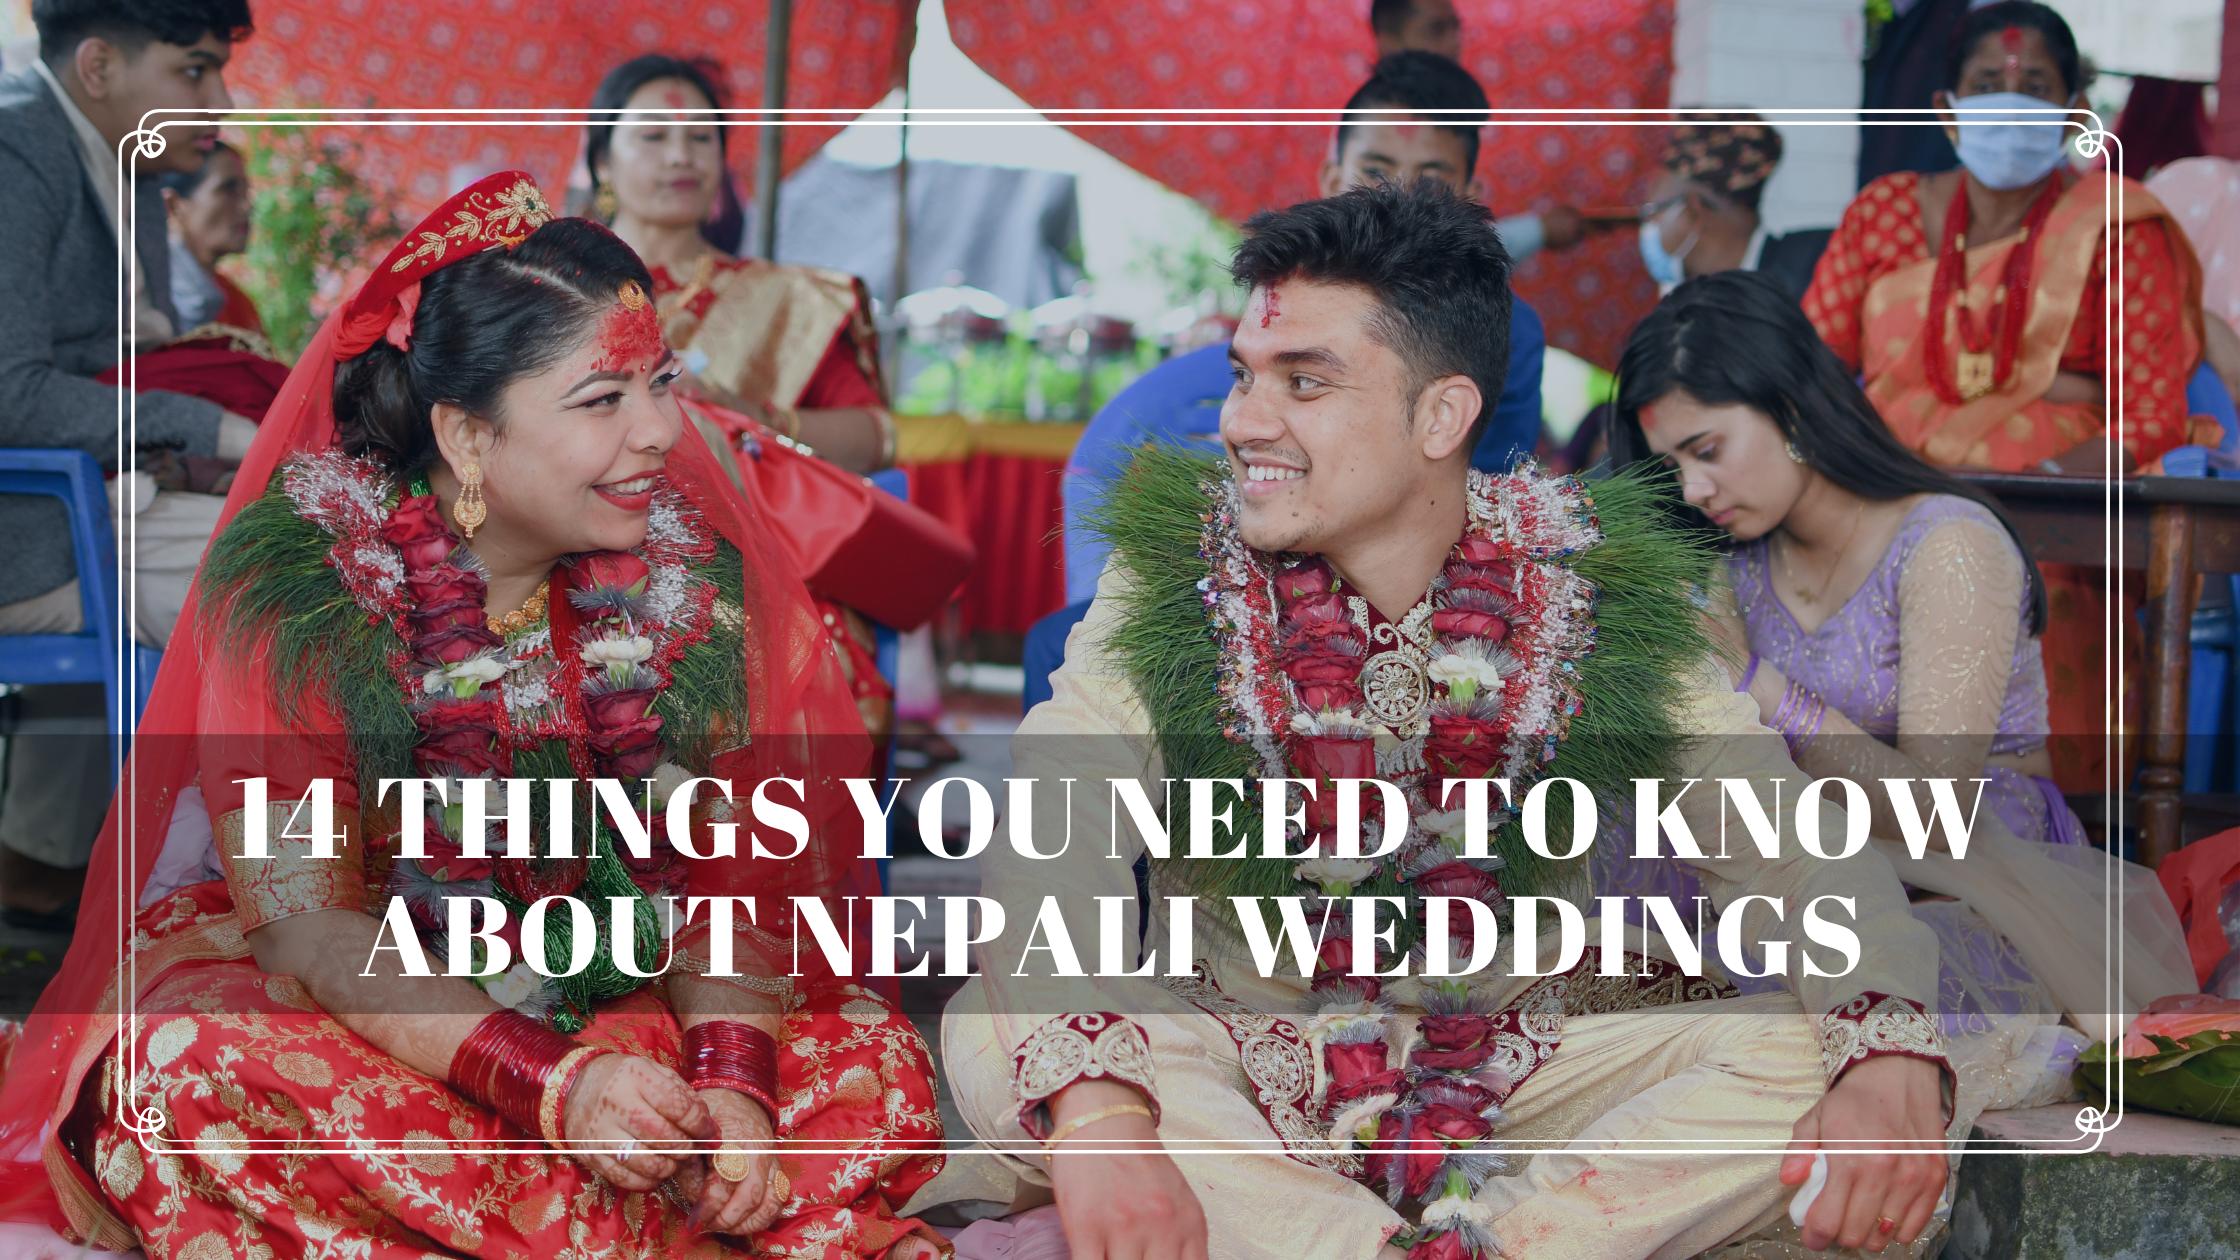 Nepali weddings